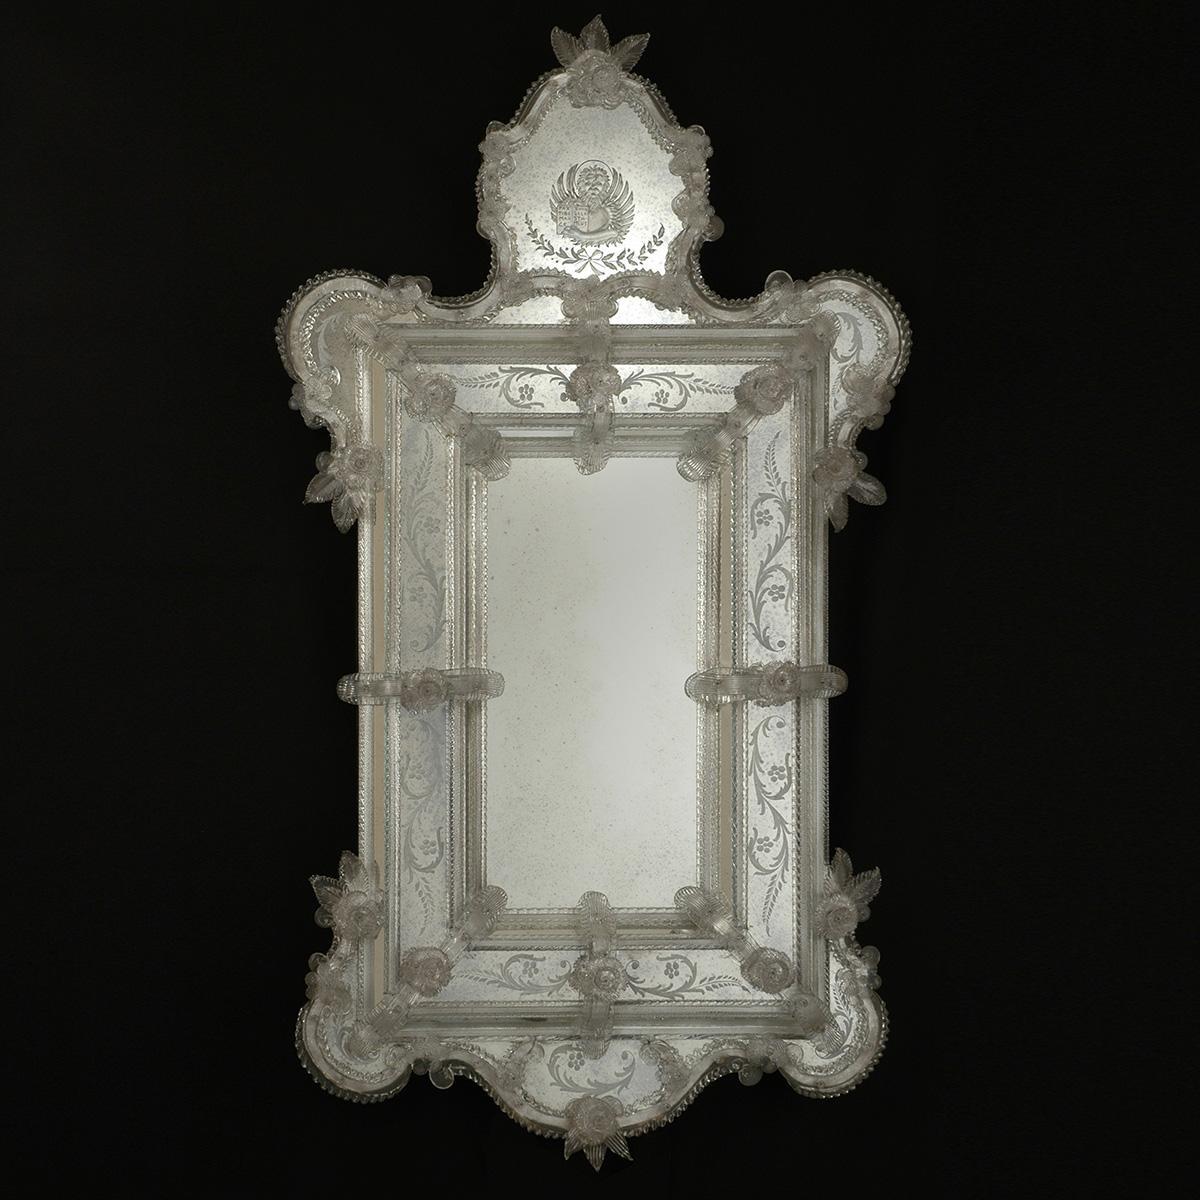 """Egidia"" miroir vénitien en verre de Murano"